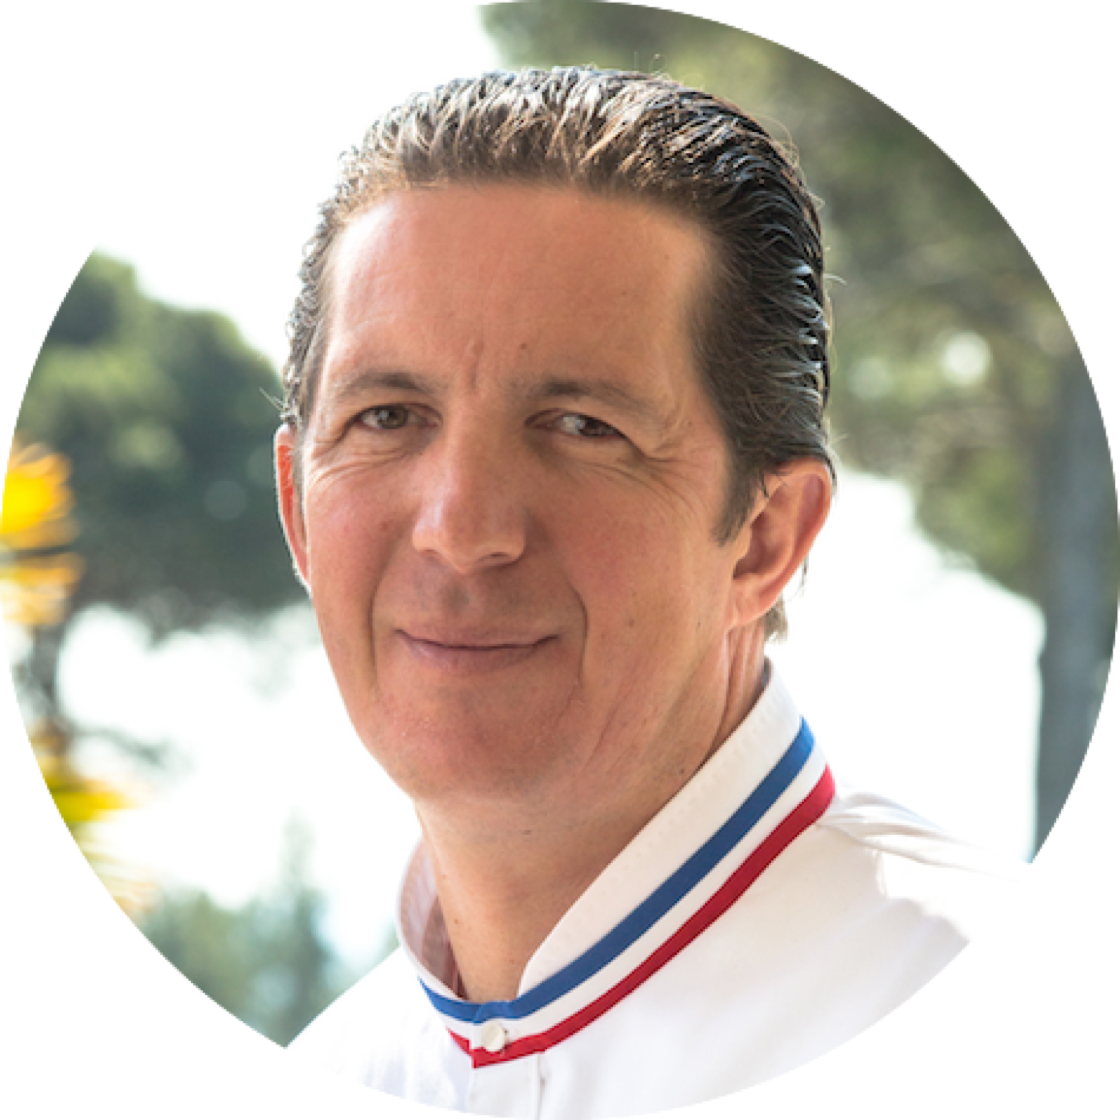 https://d3h1lg3ksw6i6b.cloudfront.net/media/image/2018/06/14/16d2b7efadf9408bb63095d6afe8fe5a_Portrait+Chef+Christophe+Bacquie%CC%81.png